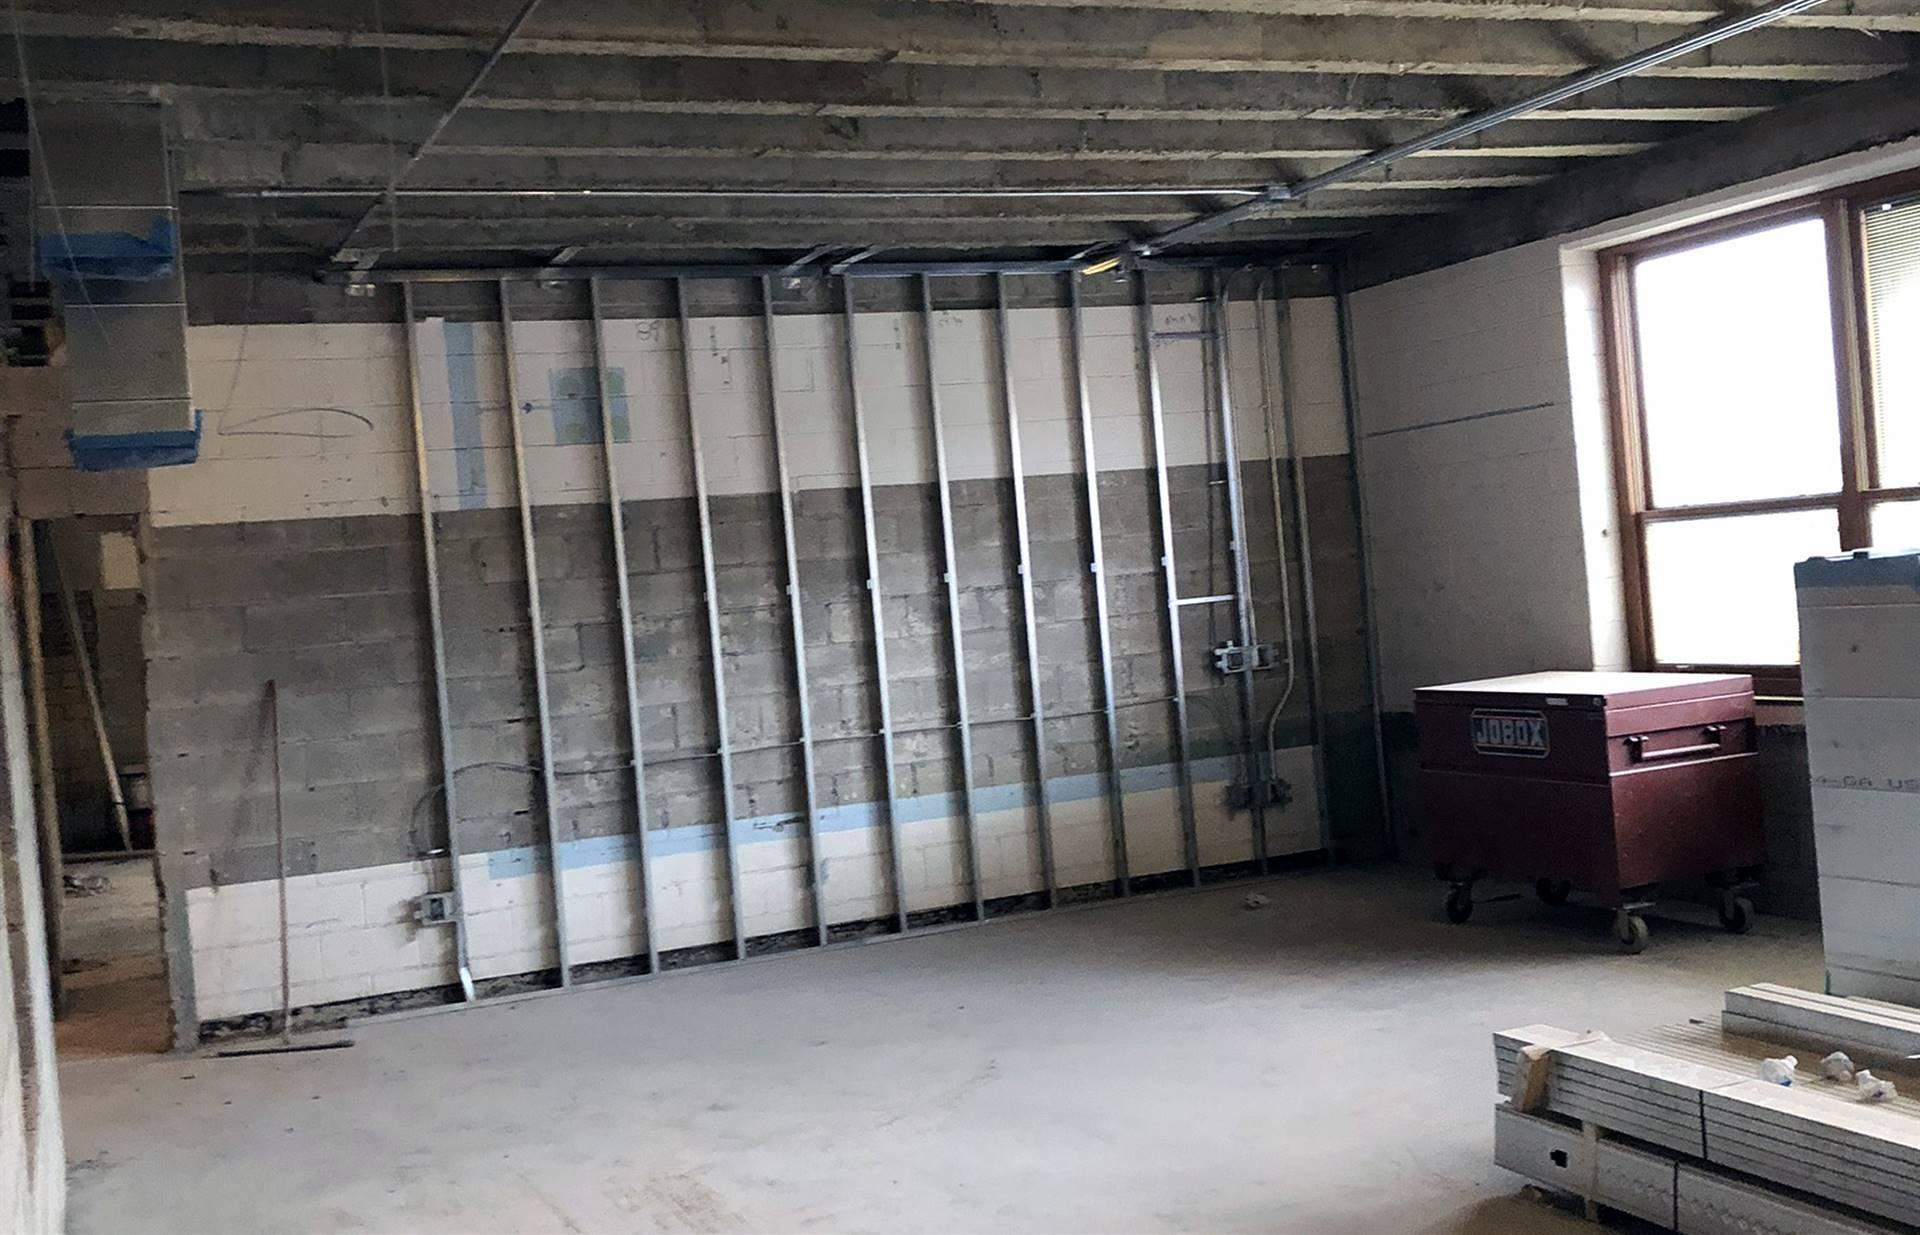 Progress on the Tremont Elementary School second floor interior renovation